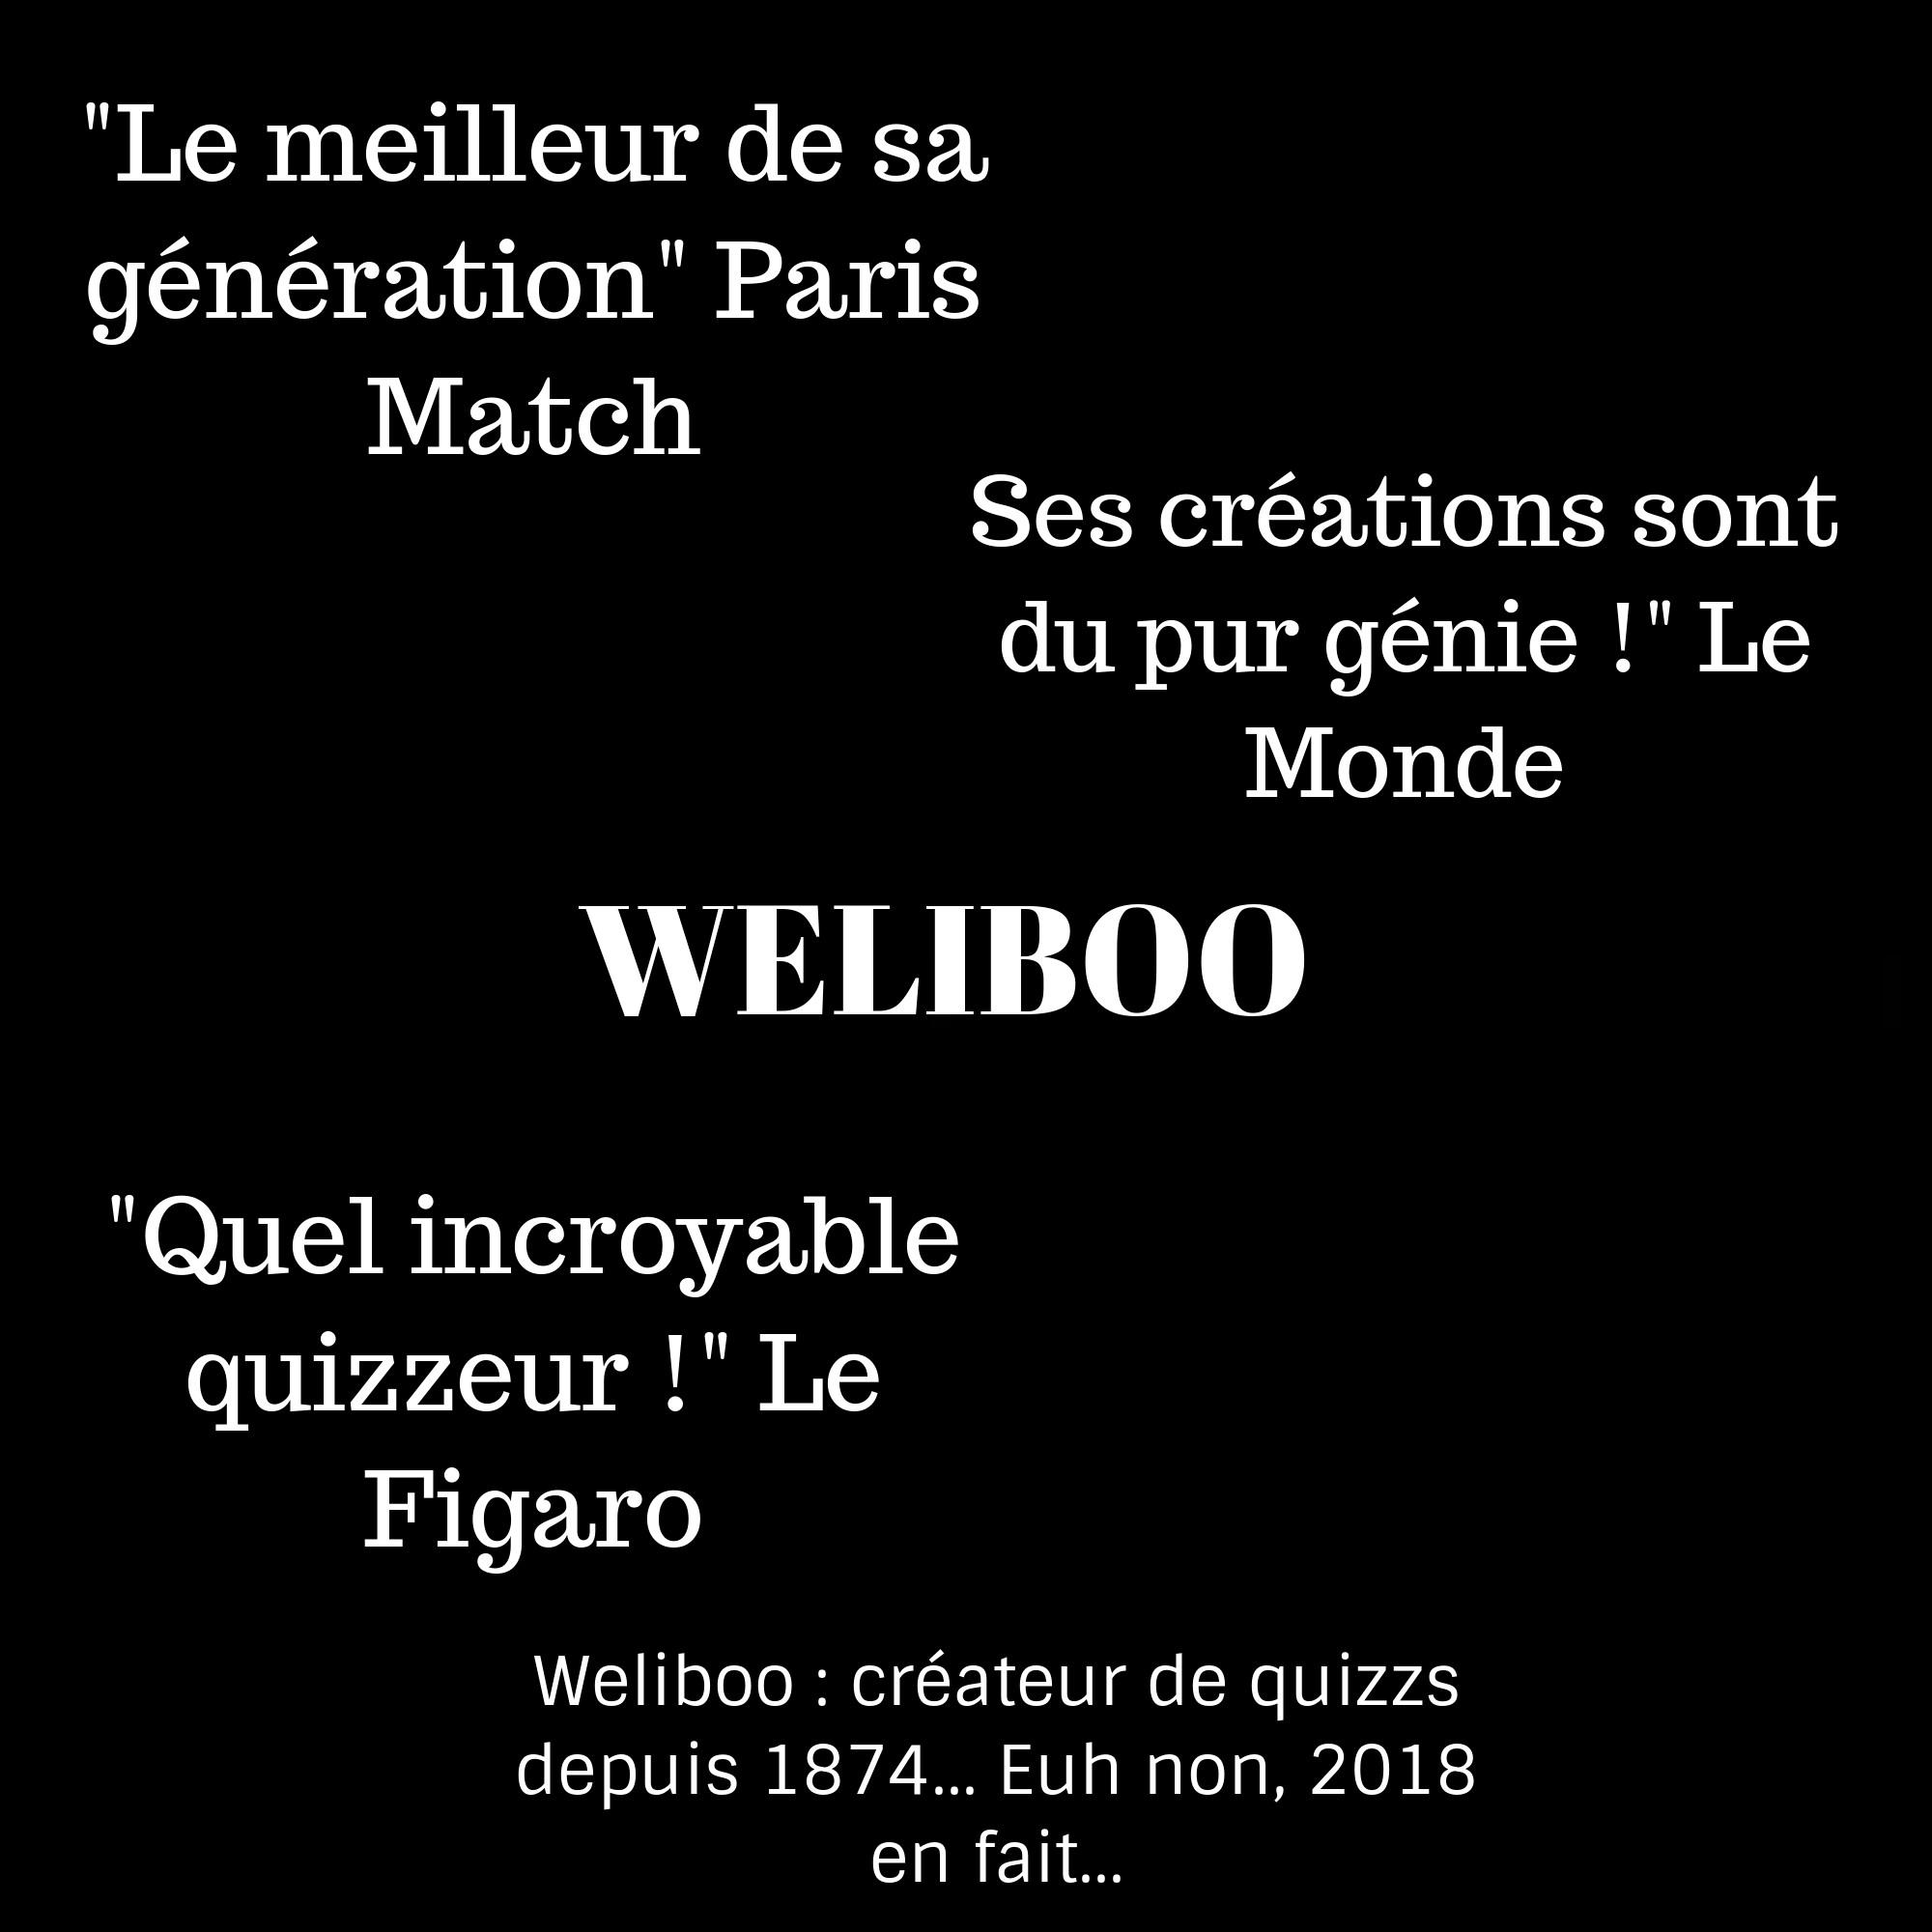 Devinettes à la Weliboo !